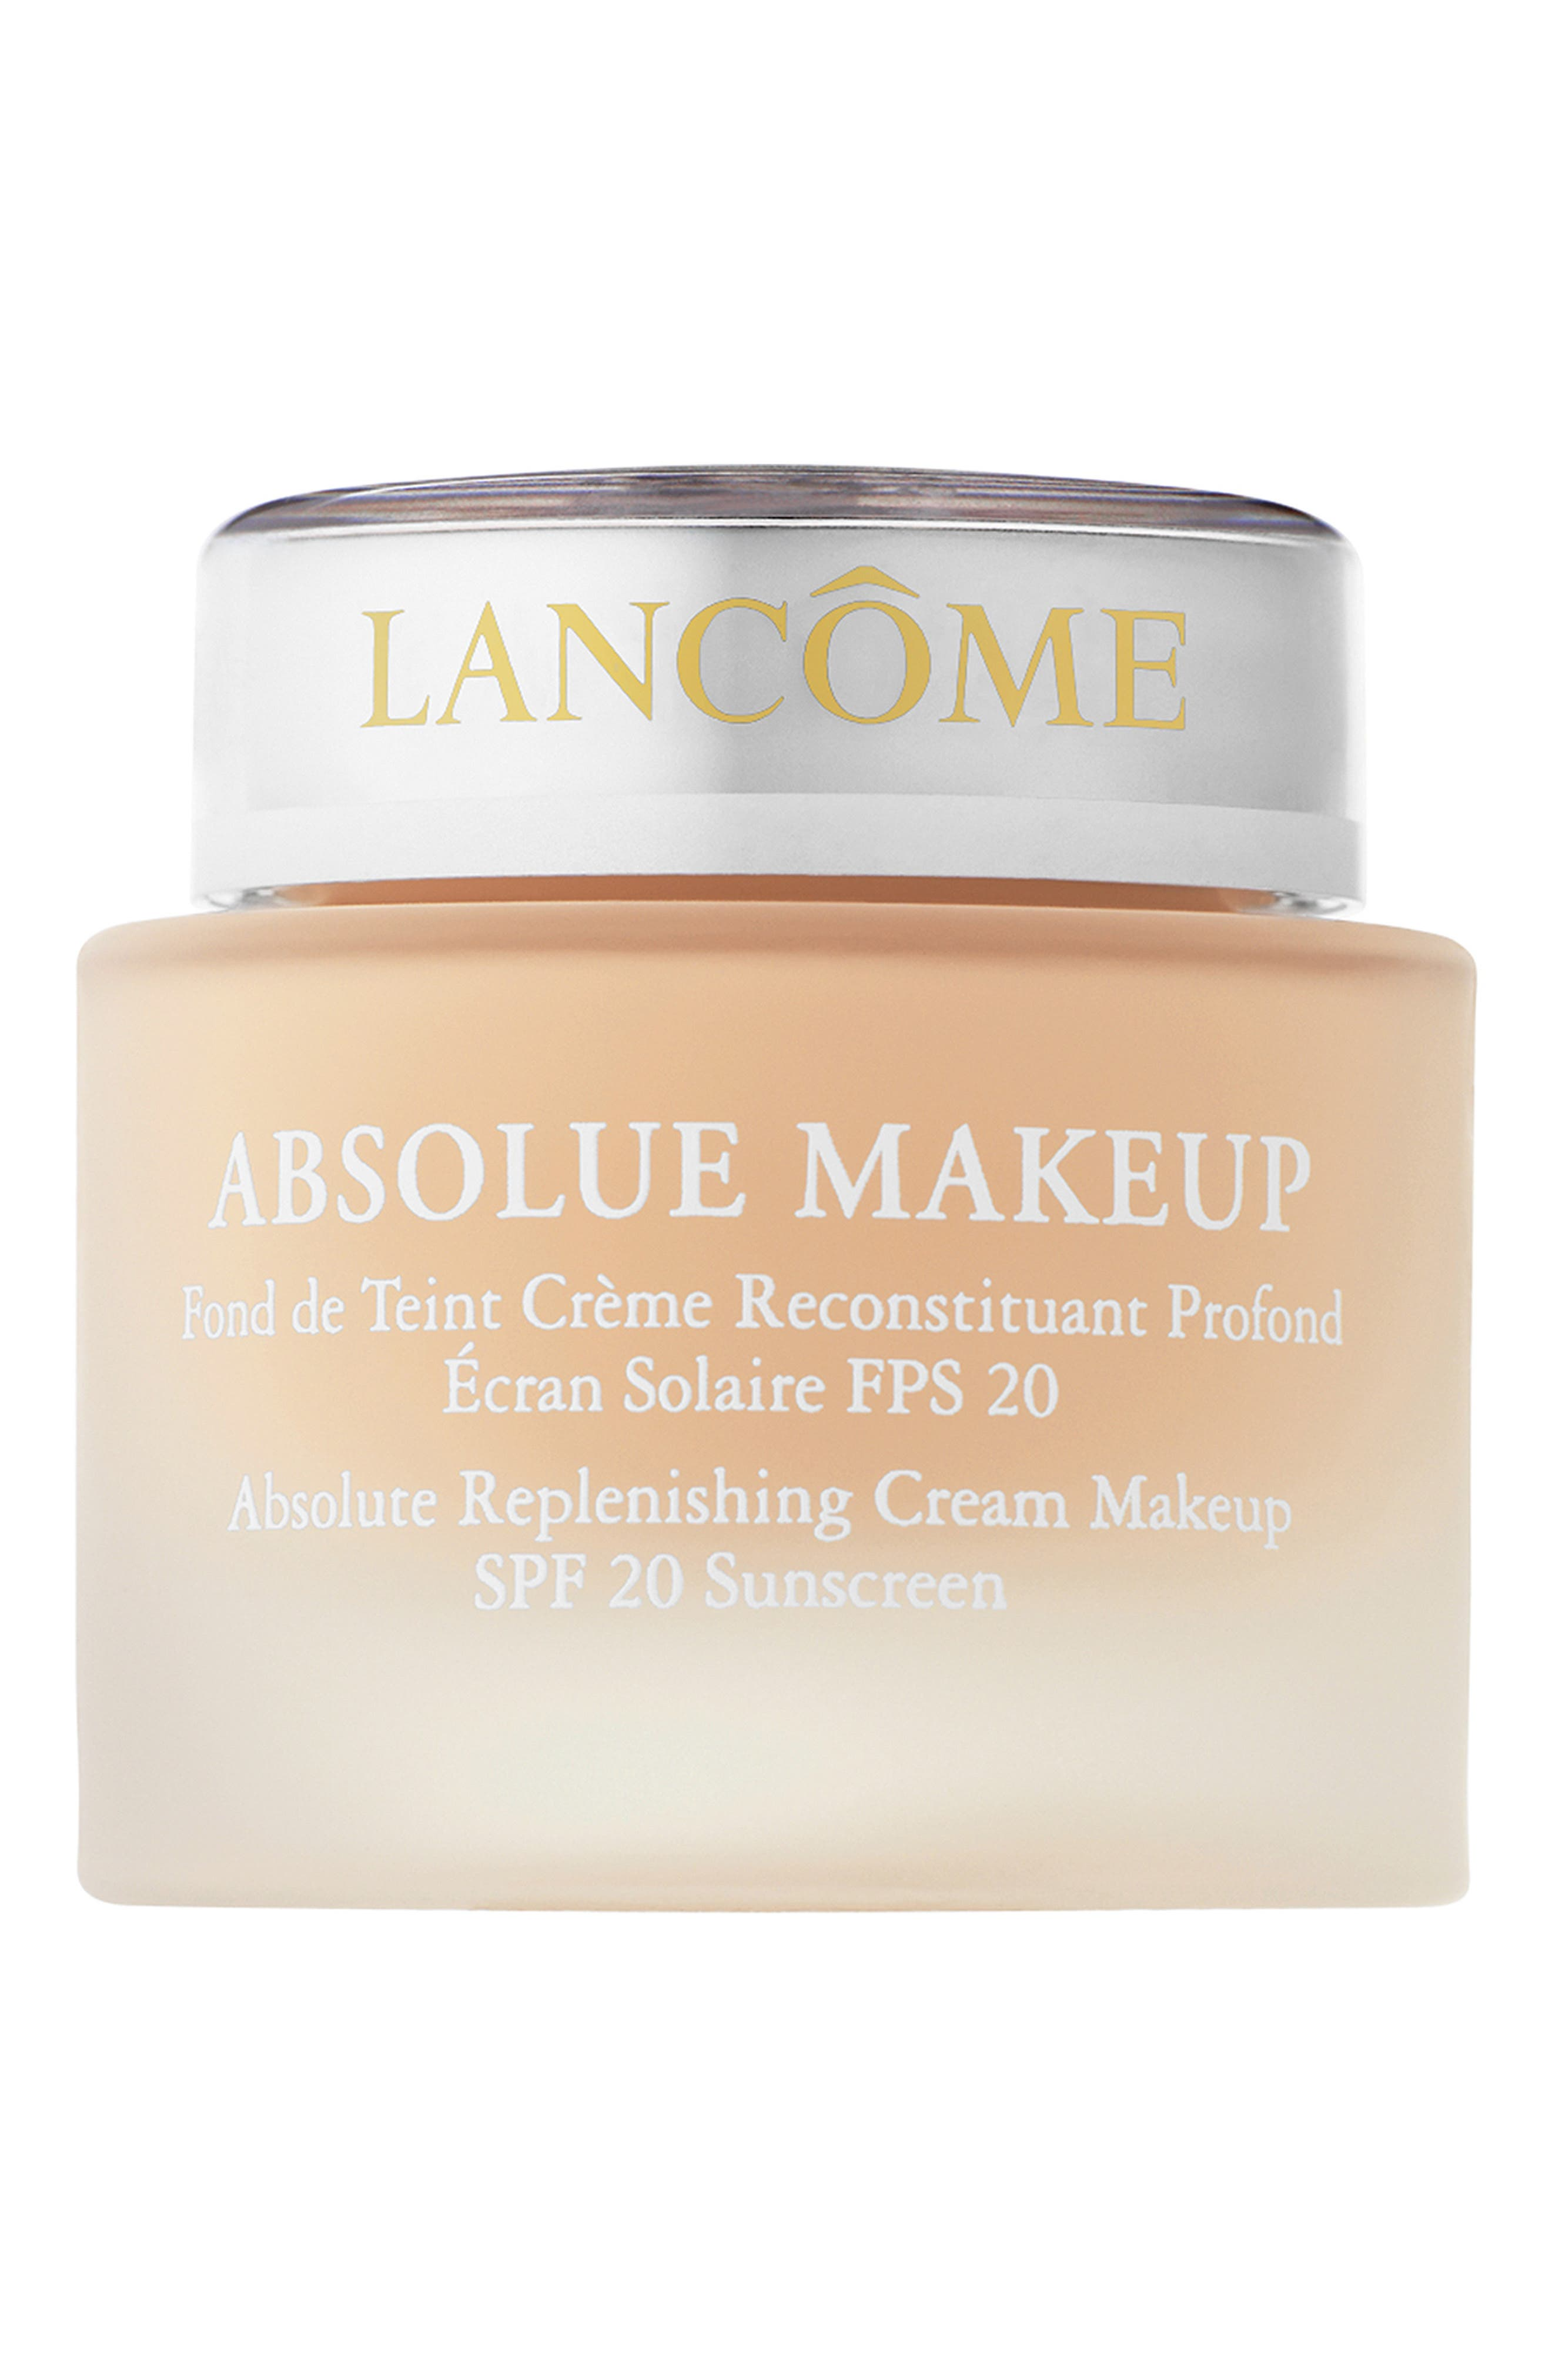 Lancome Absolue Replenishing Cream Makeup Foundation Spf 20 Sunscreen